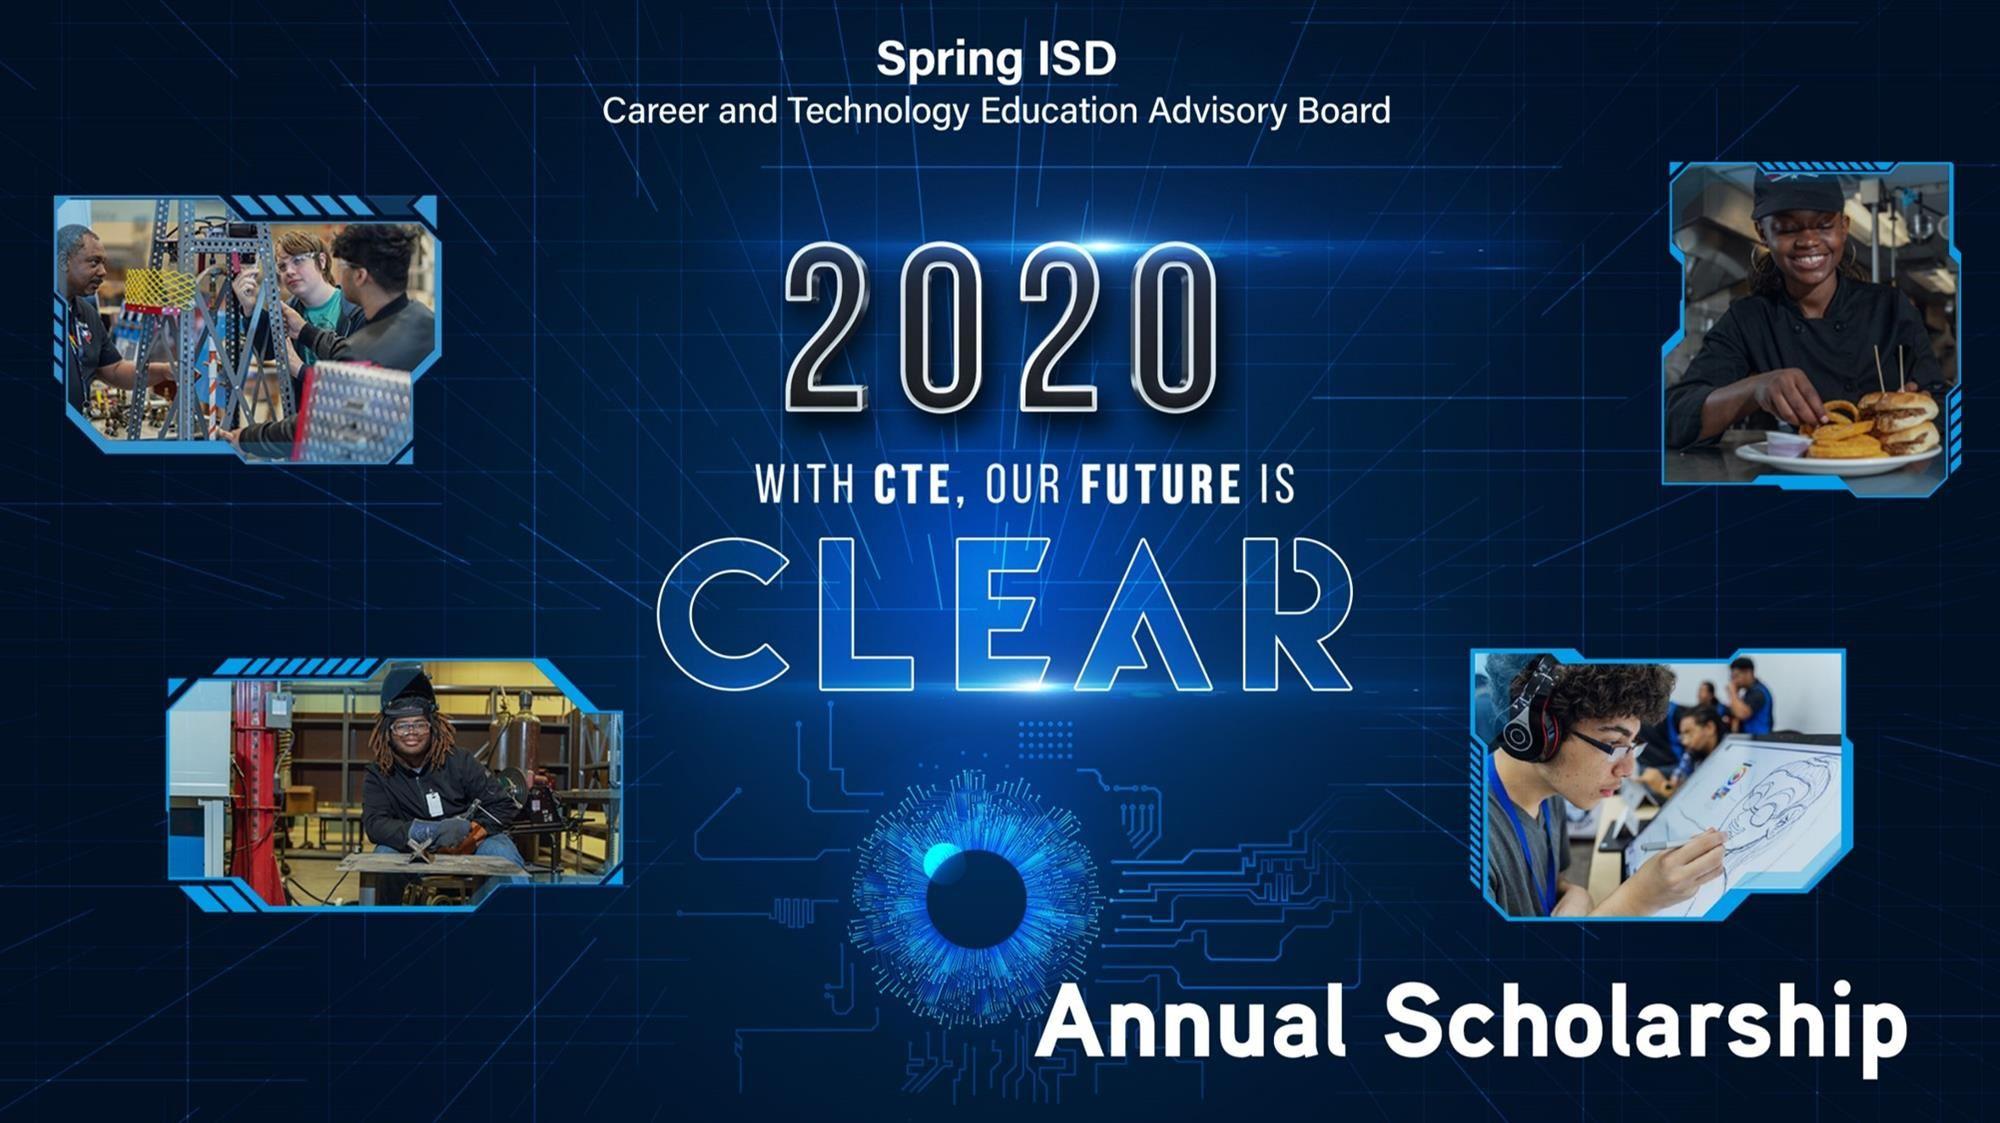 CTE Advisory Board Awards 20 Scholarships totaling $20,000 to 20 Seniors in 2020